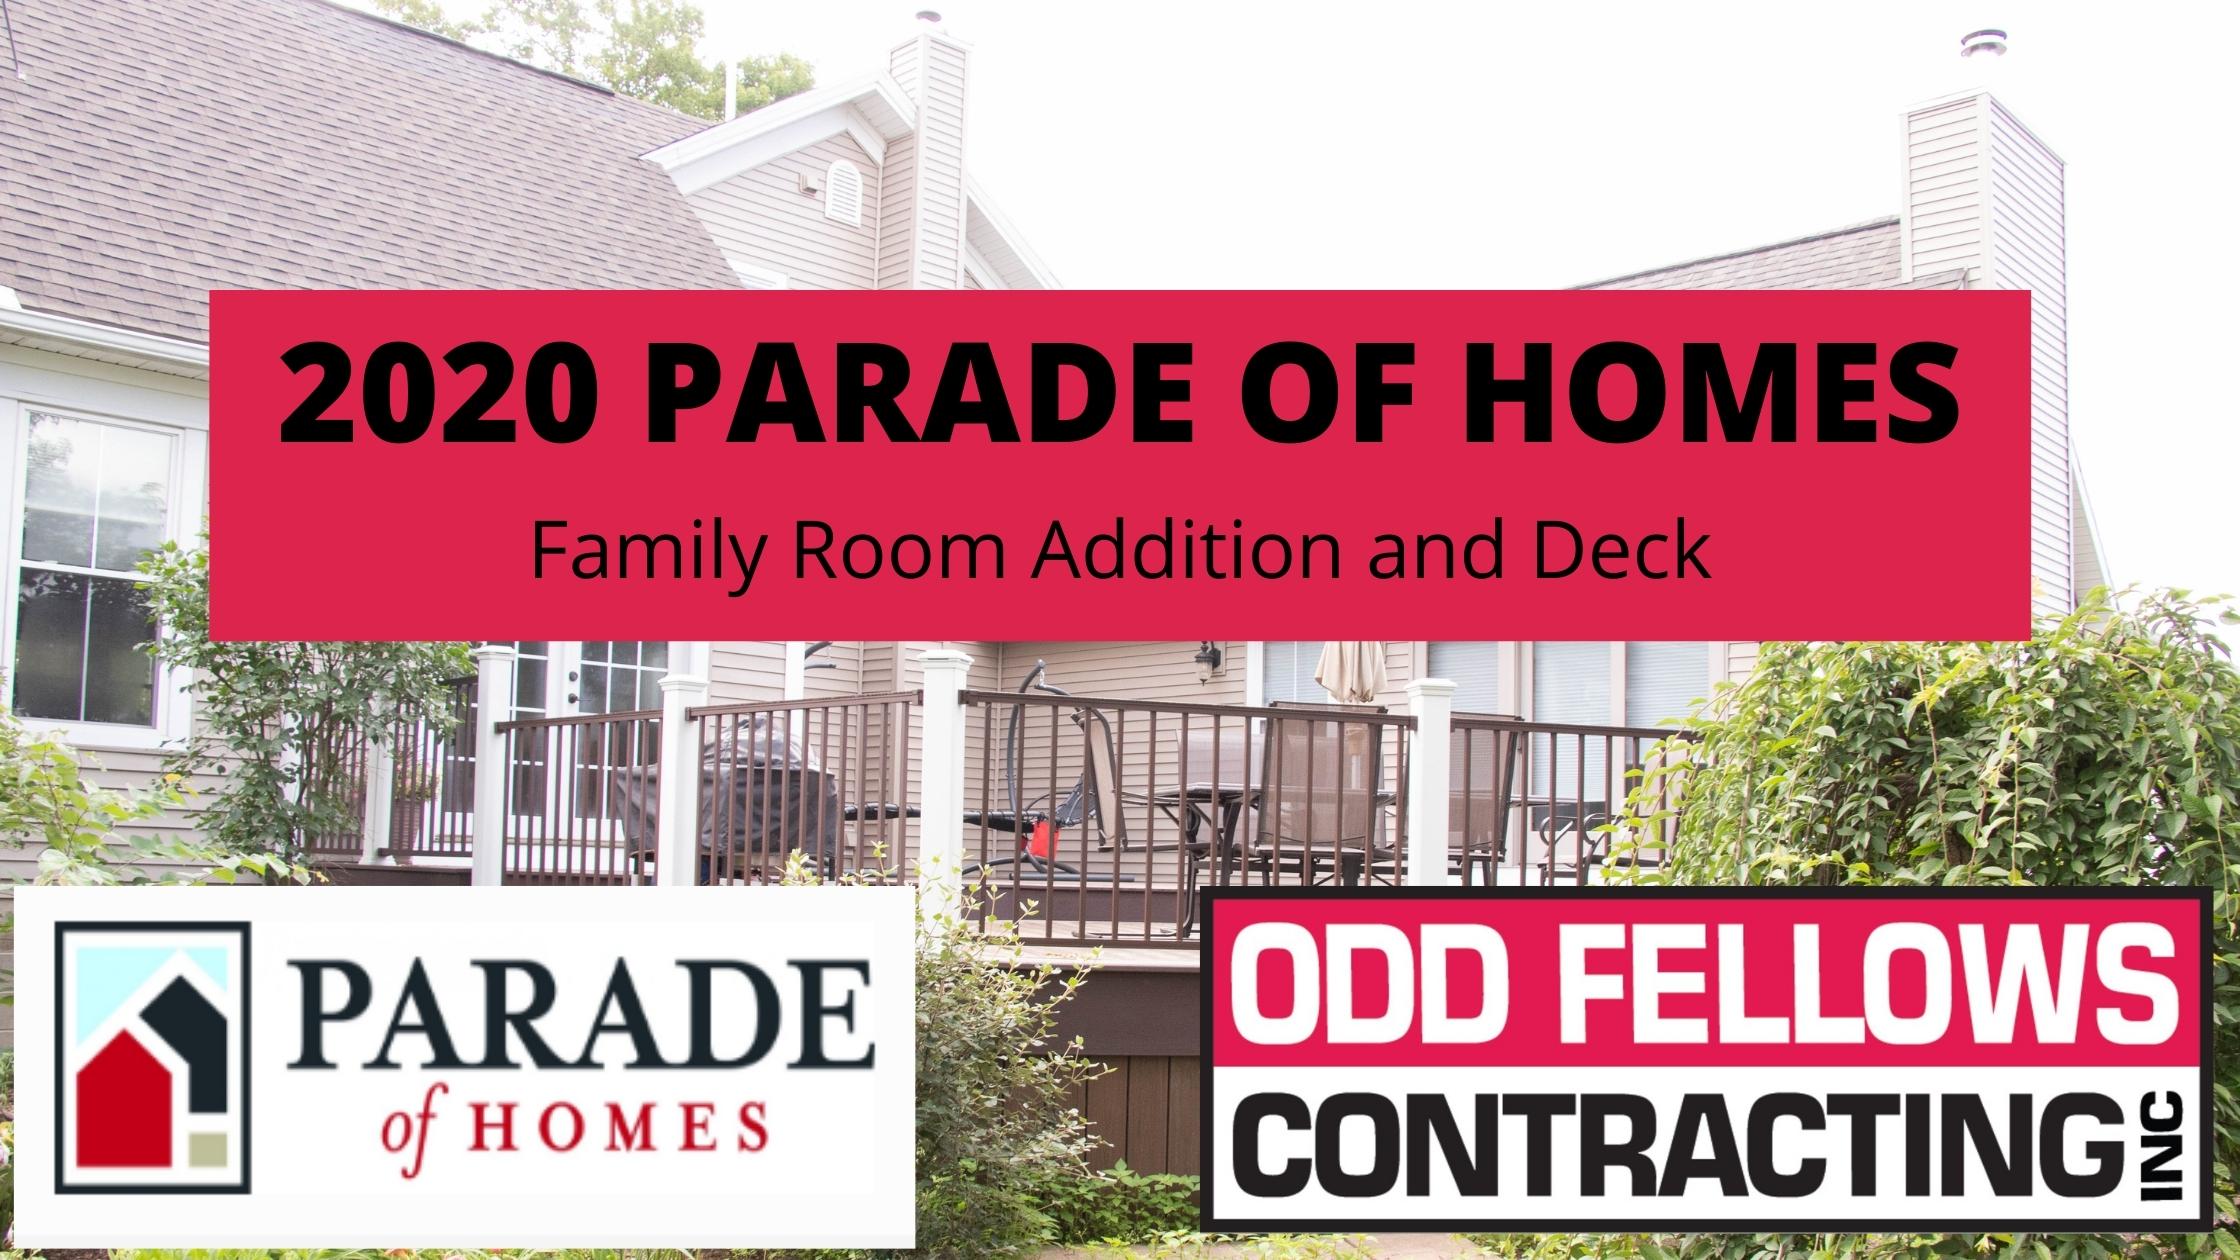 Parade-of-Homes-1